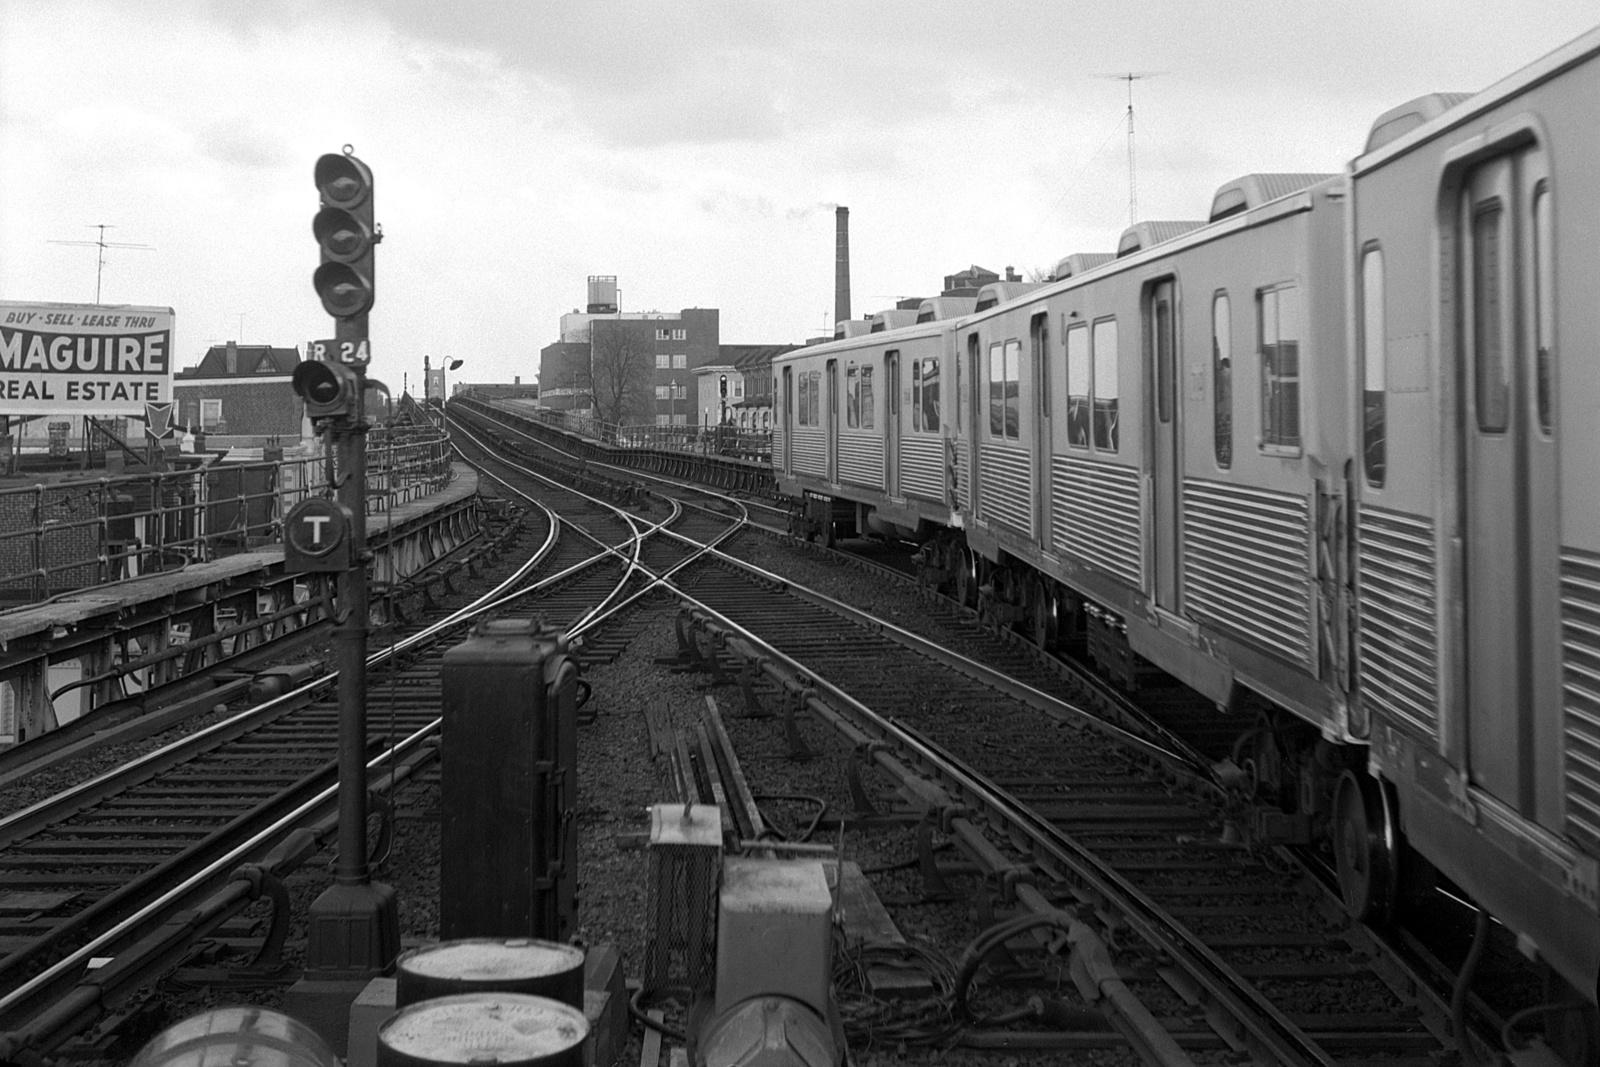 (564k, 1600x1067)<br><b>Country:</b> United States<br><b>City:</b> Philadelphia, PA<br><b>System:</b> SEPTA (or Predecessor)<br><b>Line:</b> Market-Frankford El<br><b>Location:</b> Frankford Terminal (Bridge/Pratt)<br><b>Car:</b> SEPTA M-3 (Budd, 1960)  <br><b>Collection of:</b> David Pirmann<br><b>Date:</b> 4/2/1966<br><b>Viewed (this week/total):</b> 4 / 149